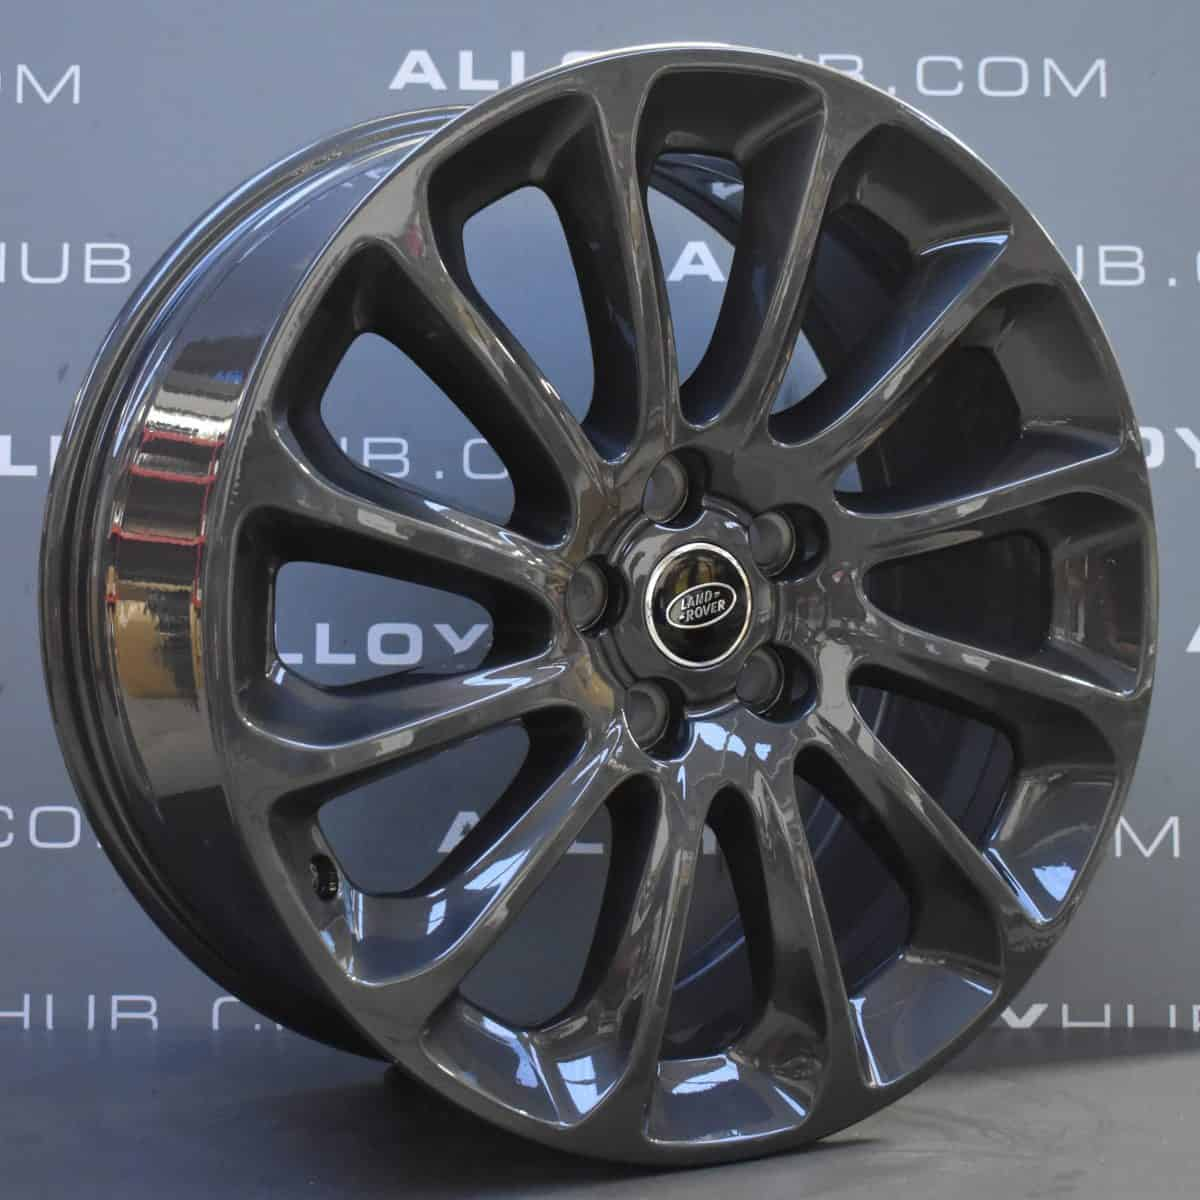 "Genuine Land Rover Range Rover Sport/Vogue L494 L405 Style 1065 20"" inch 12 Spoke Anthracite Grey Alloy Wheels LR098796"